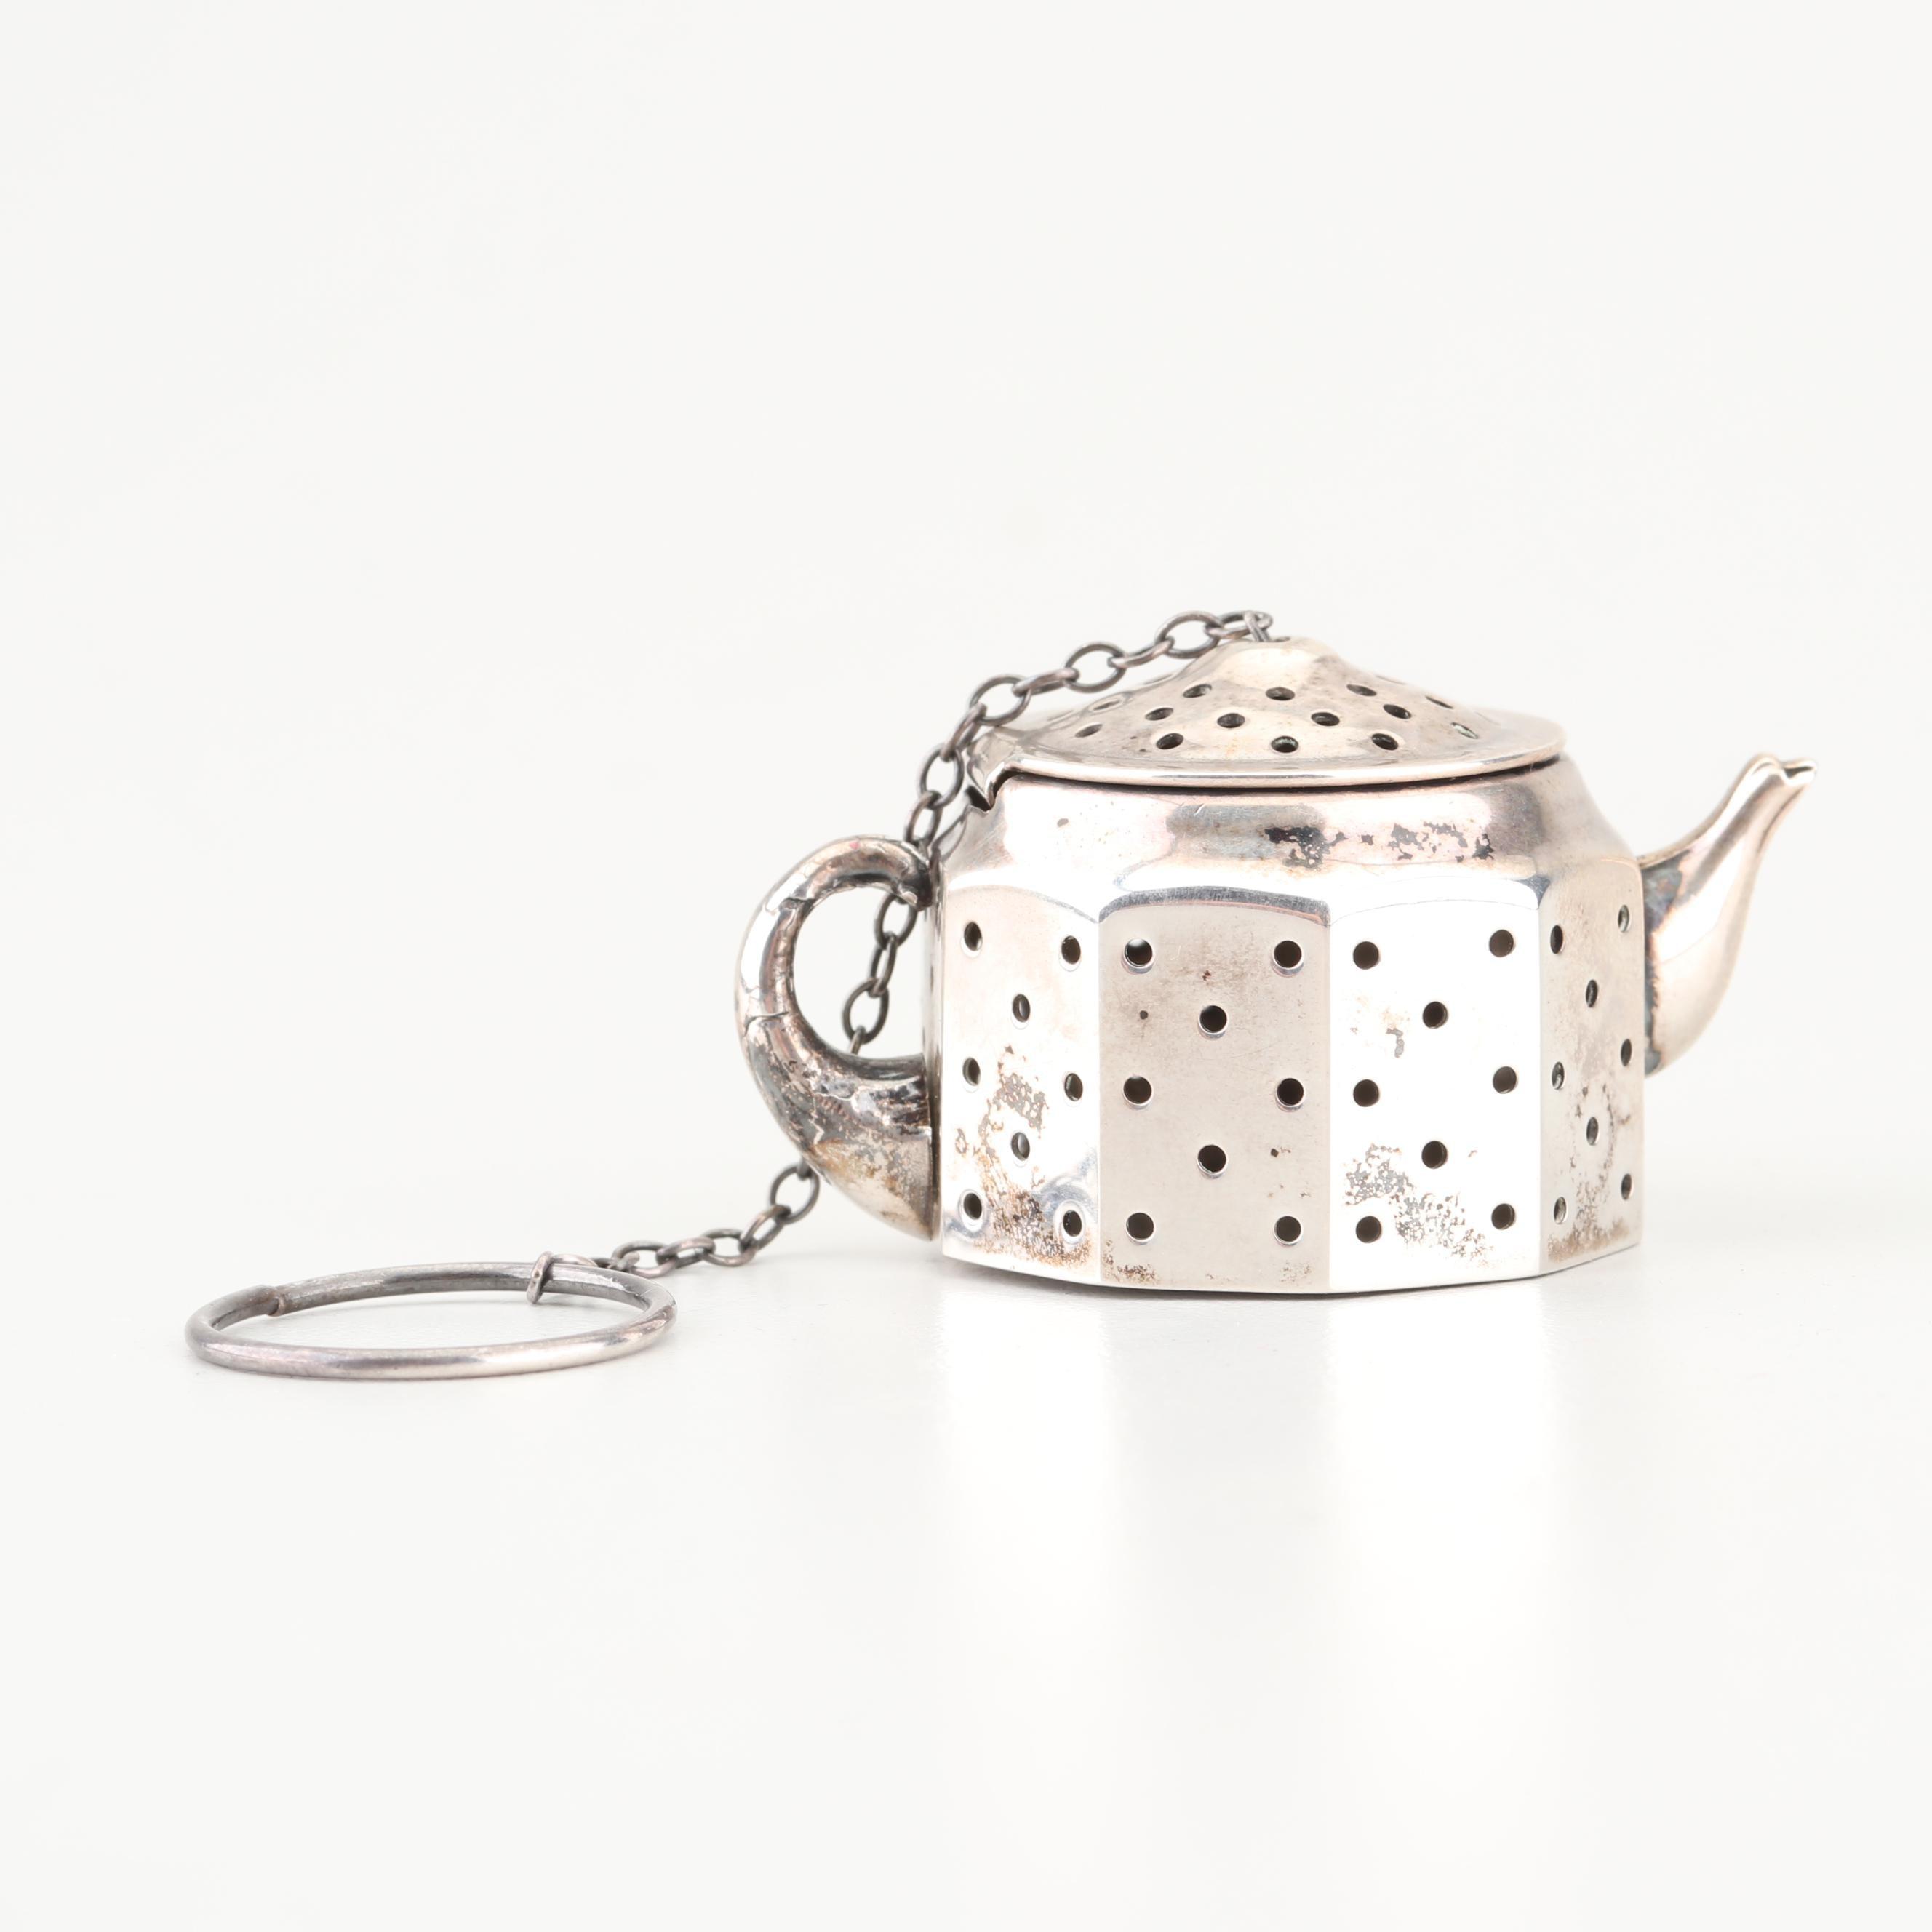 Amcraft Sterling Silver Teapot-Shaped Tea Strainer